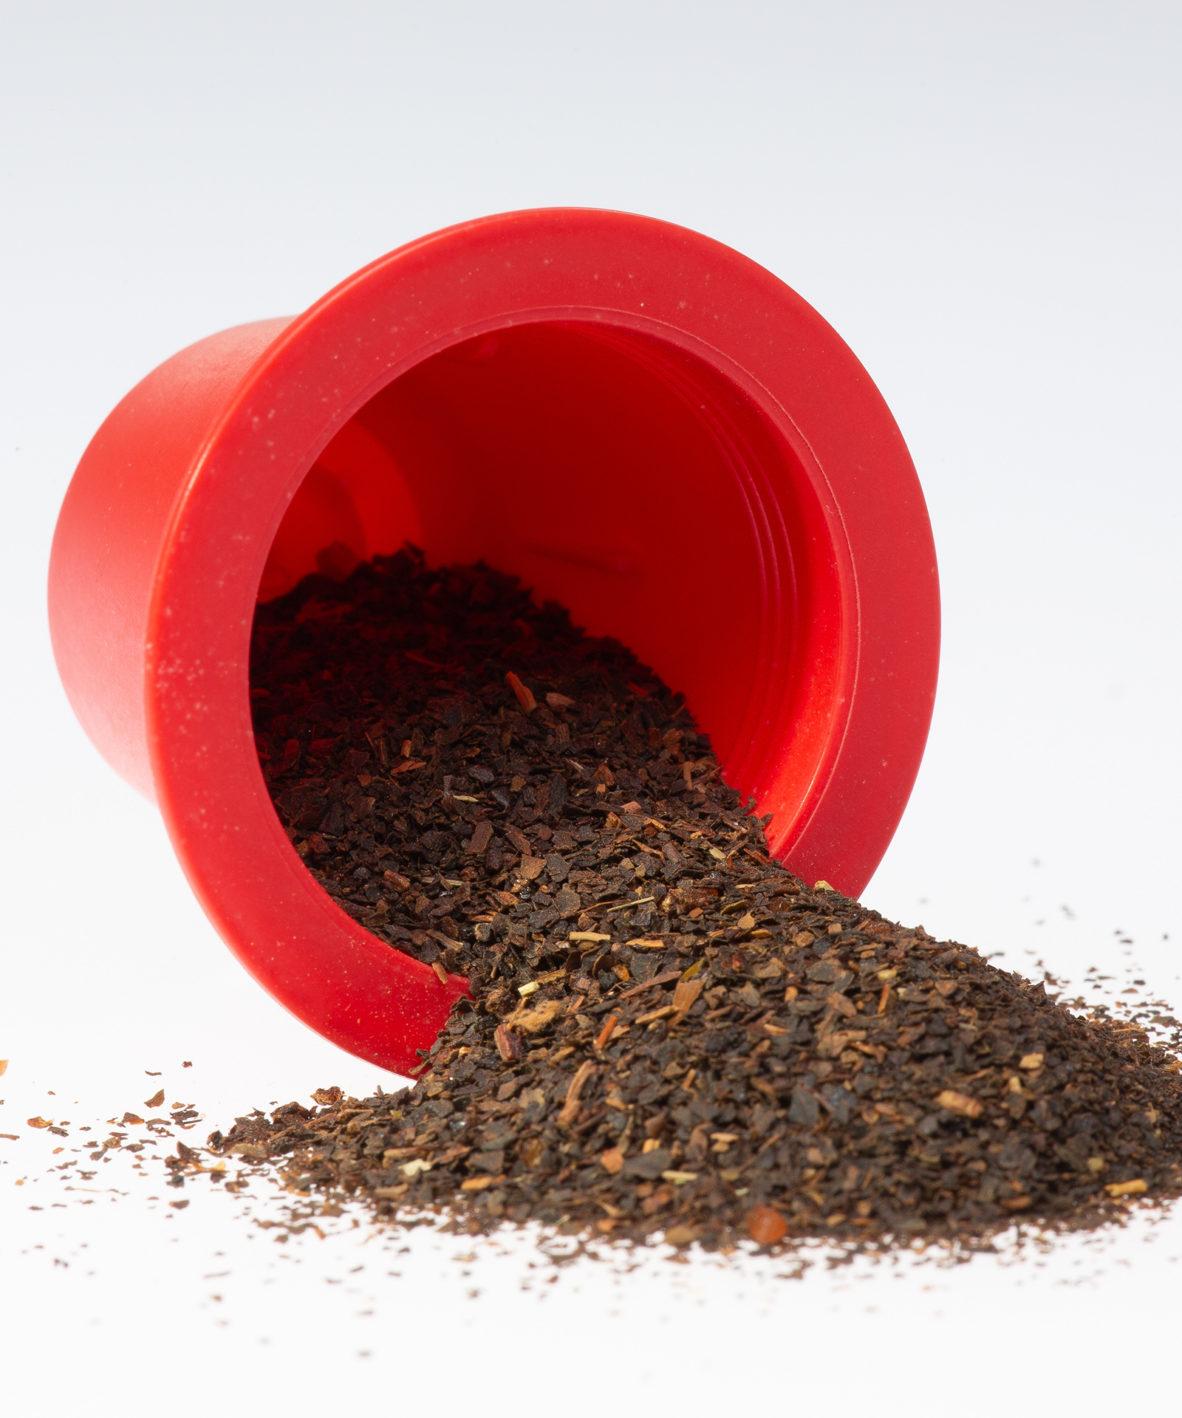 capsule Nespresso compatible thé vert bio litchi mangue